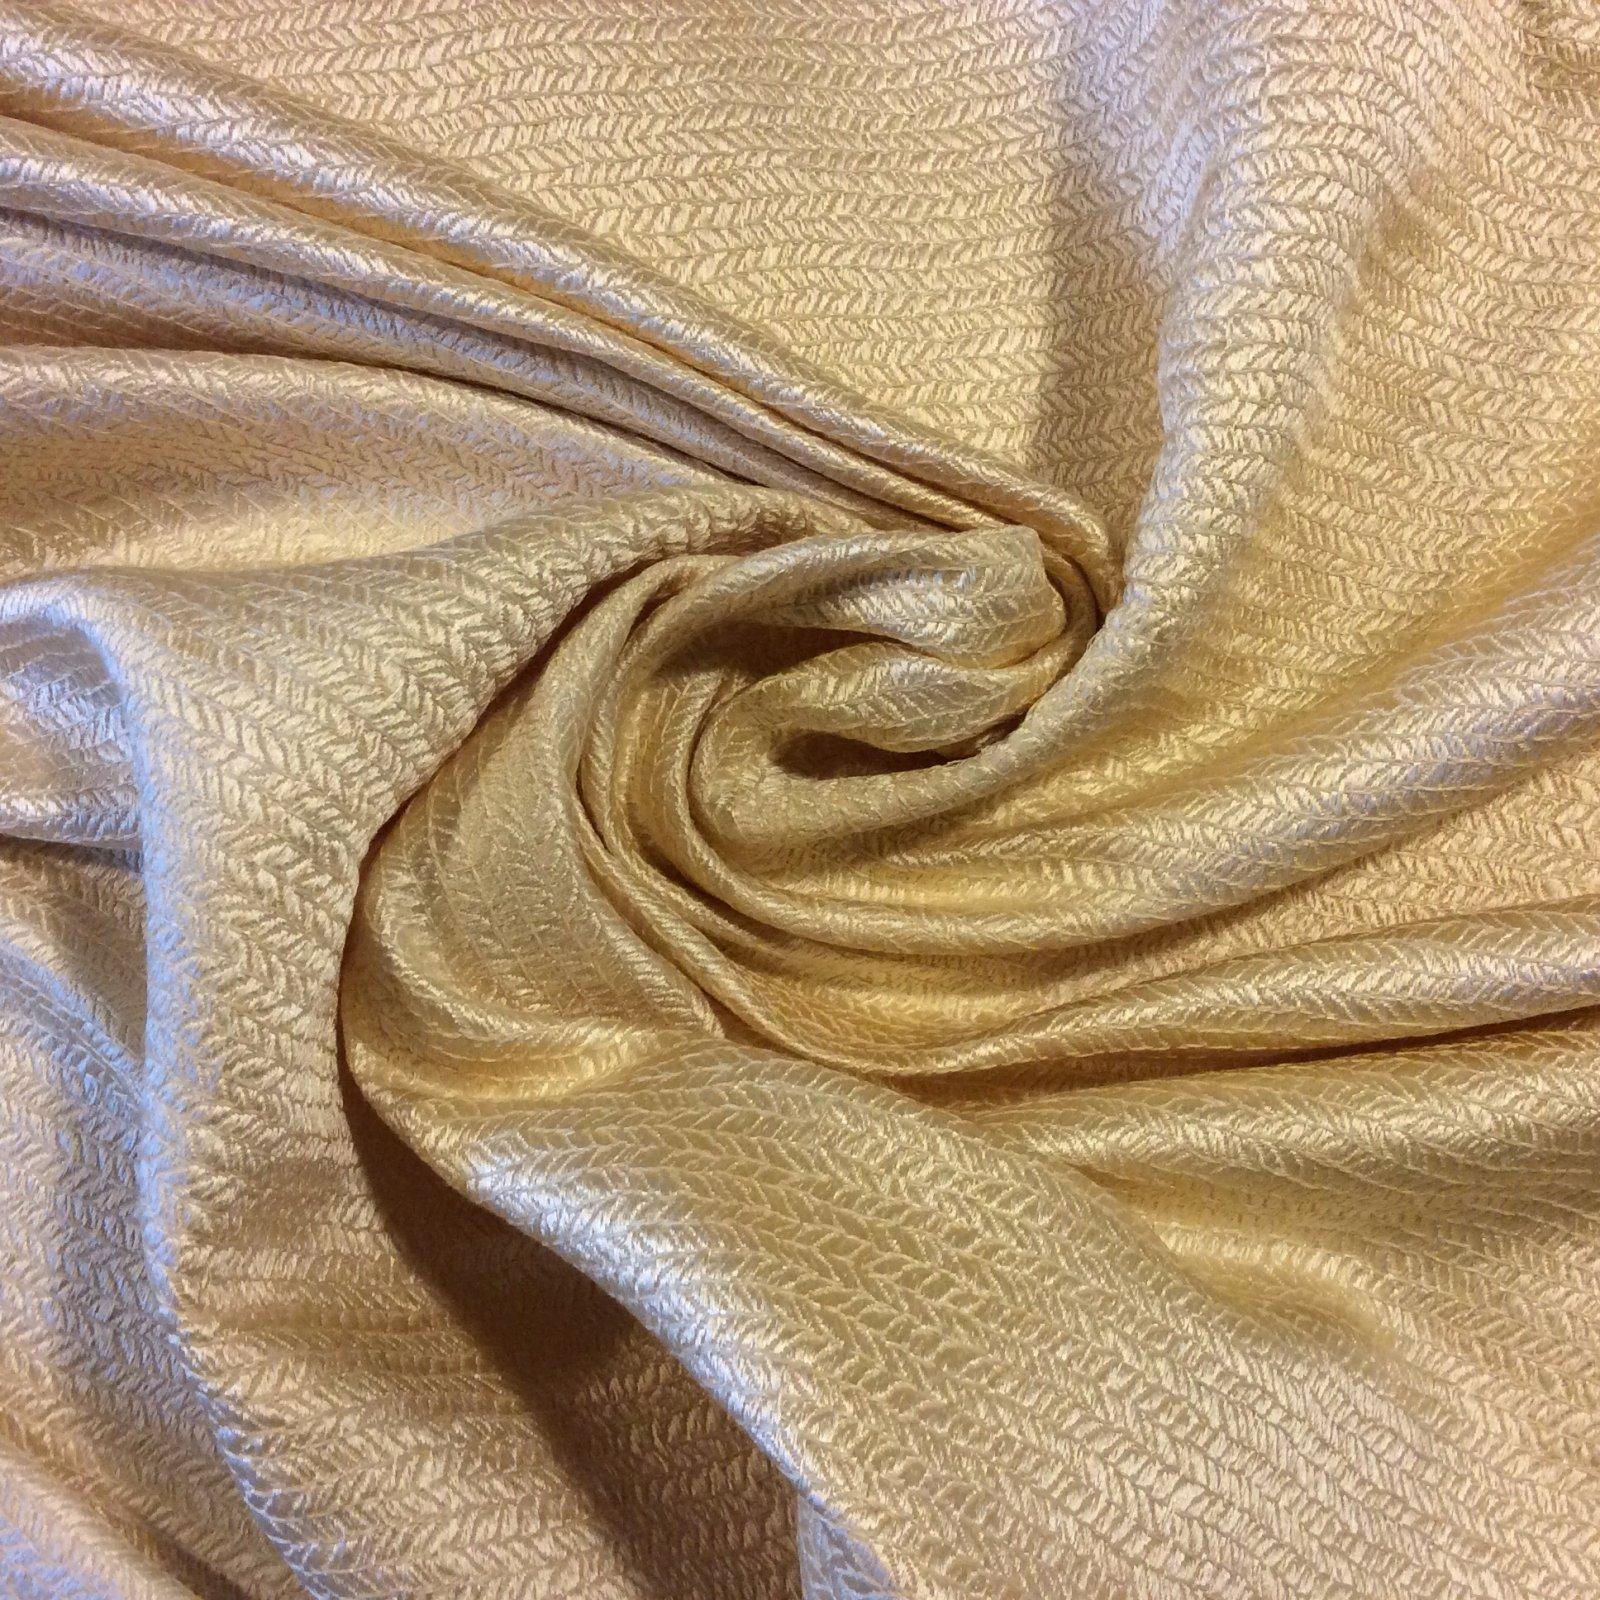 WB155 Stroheim & Romann Heavy Silk Puckered Texture Jacquard Thick Silk Light Tan Upholstery Fabric Drapery Fabric